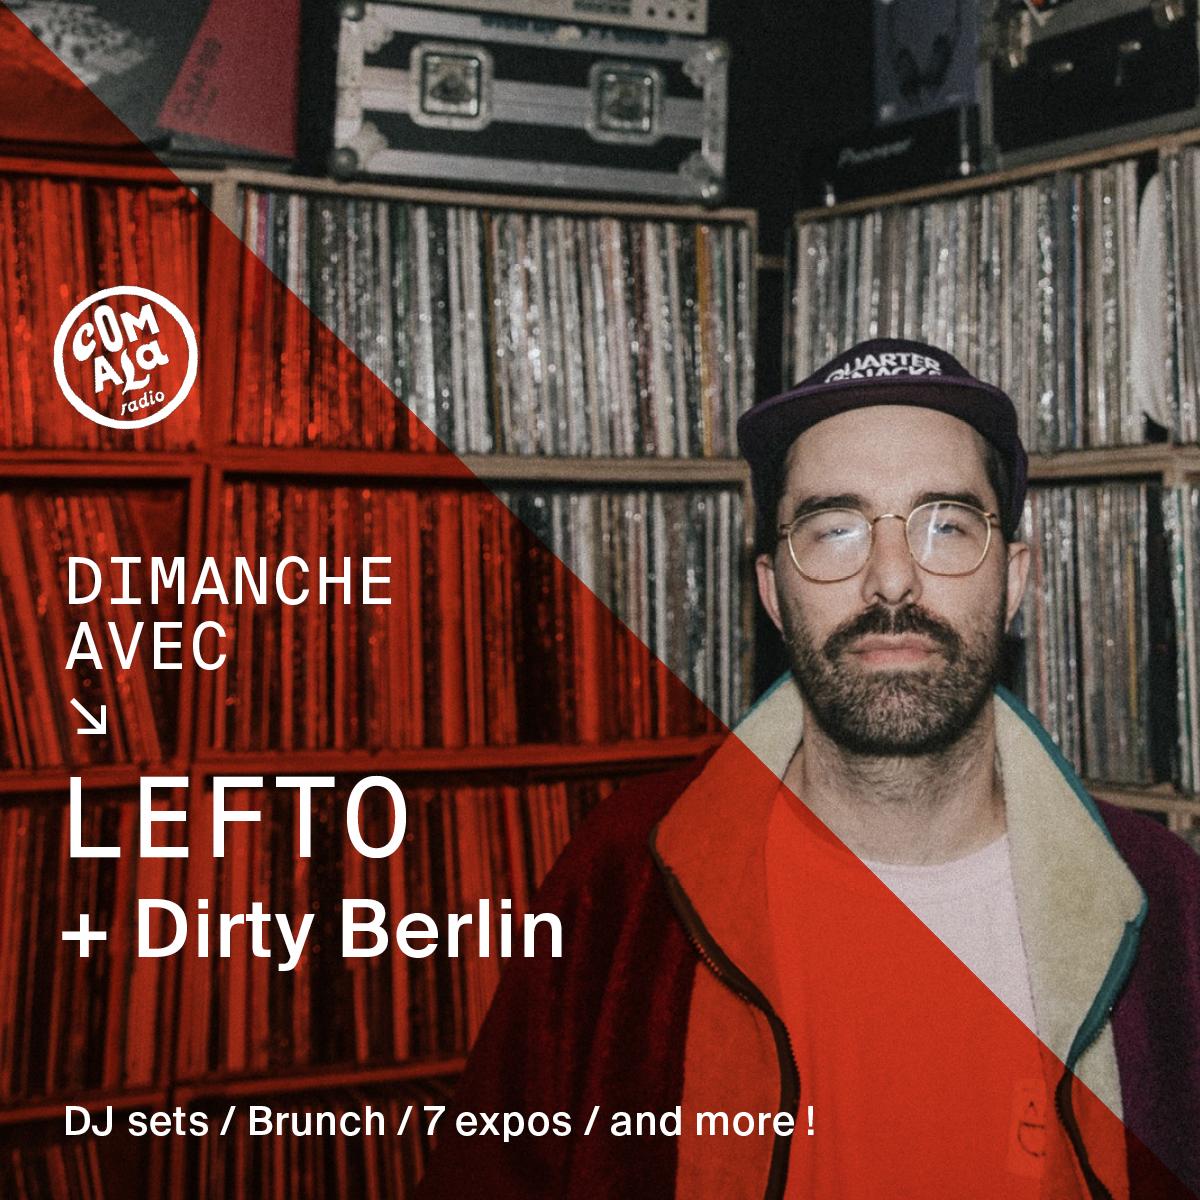 DJ sets avec Lefto + Dirty Berlin